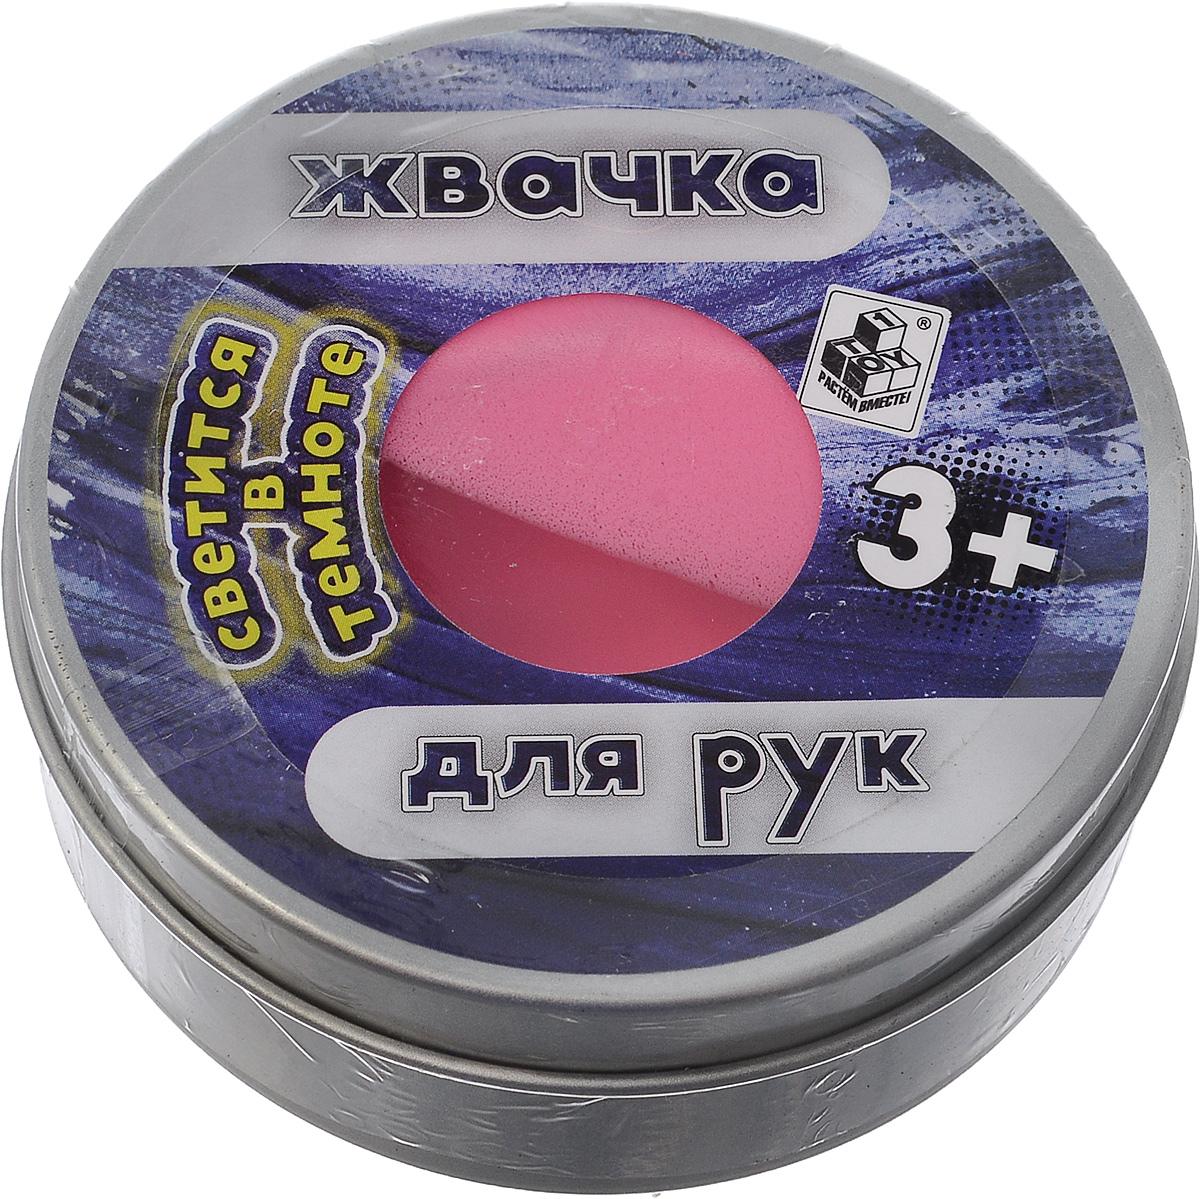 Жвачка для рук 1TOY, Т14018, 80 г цена в Москве и Питере